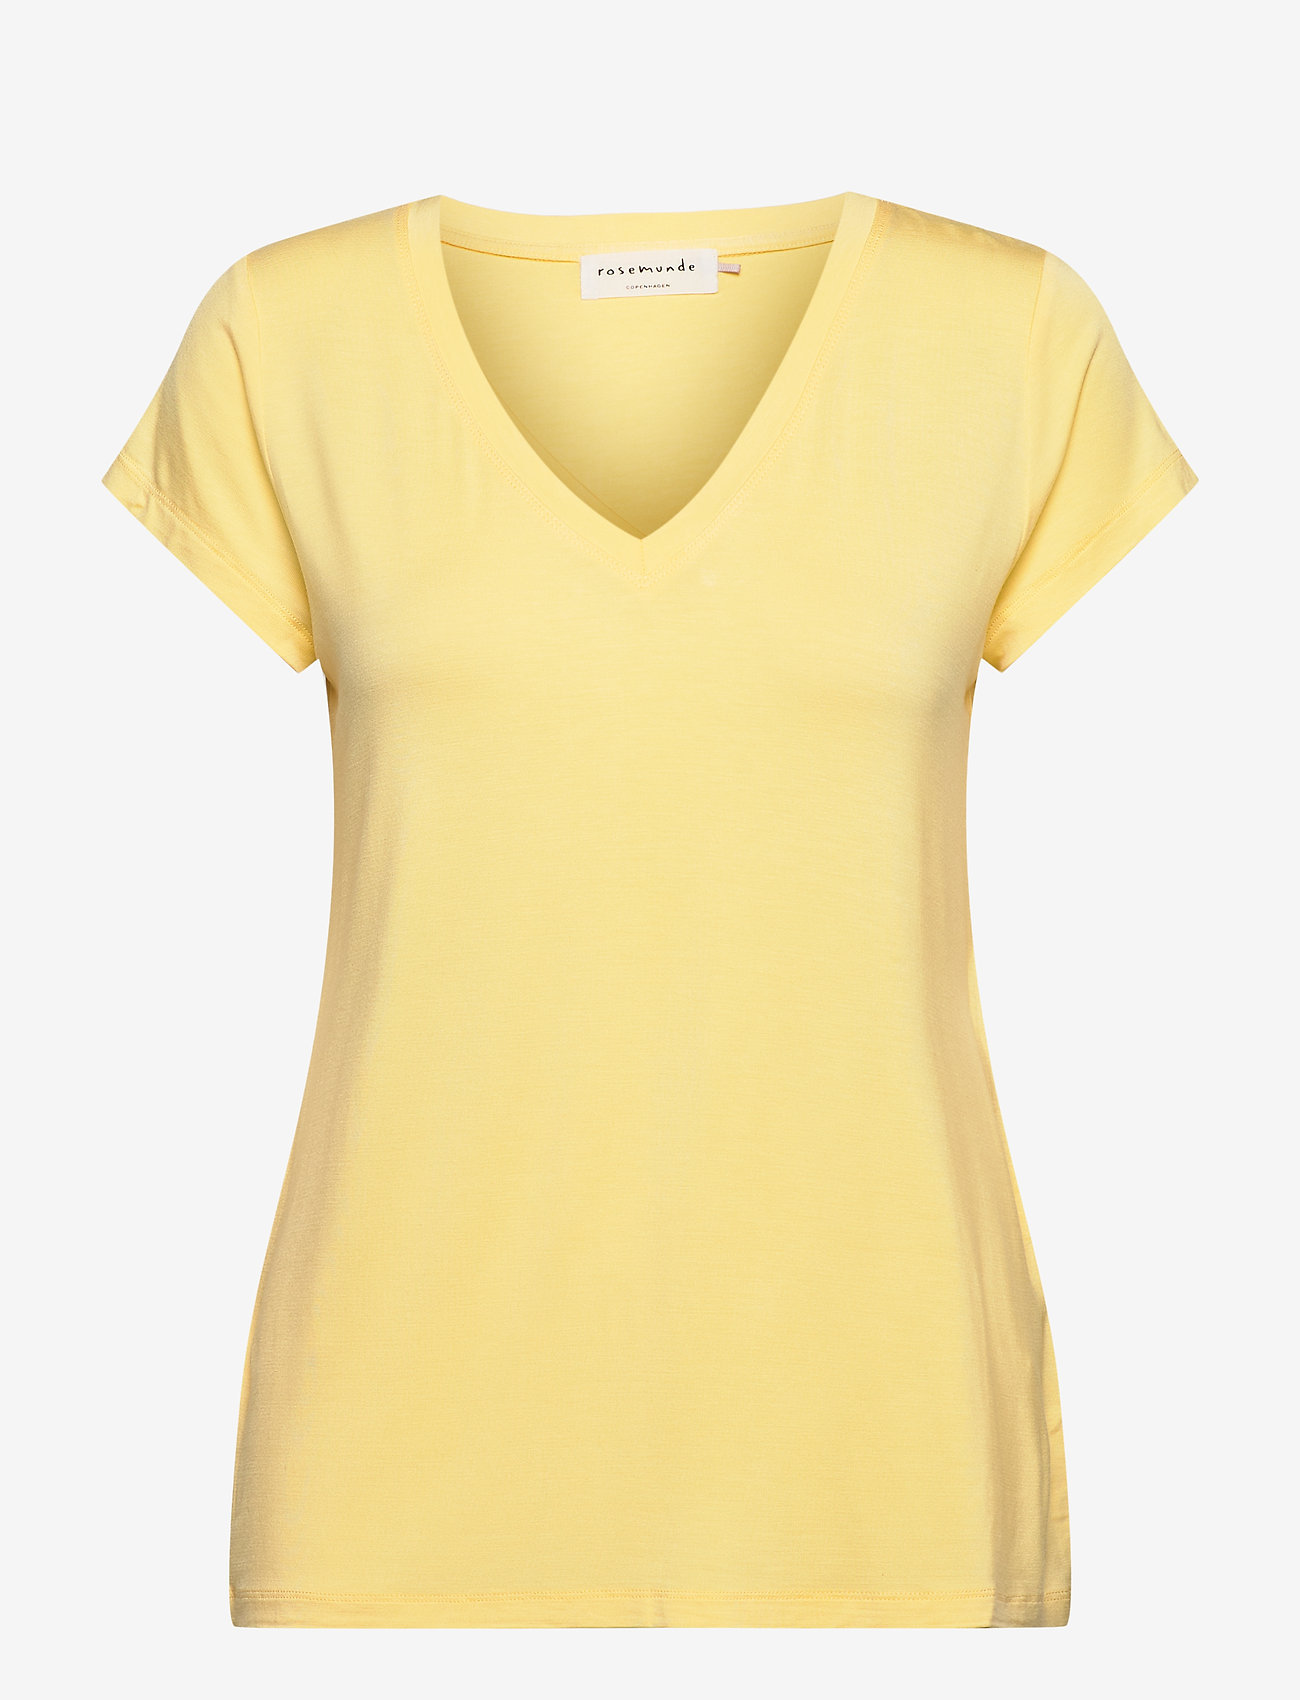 Rosemunde - T-shirt ss - t-shirts - vanilla yellow - 0